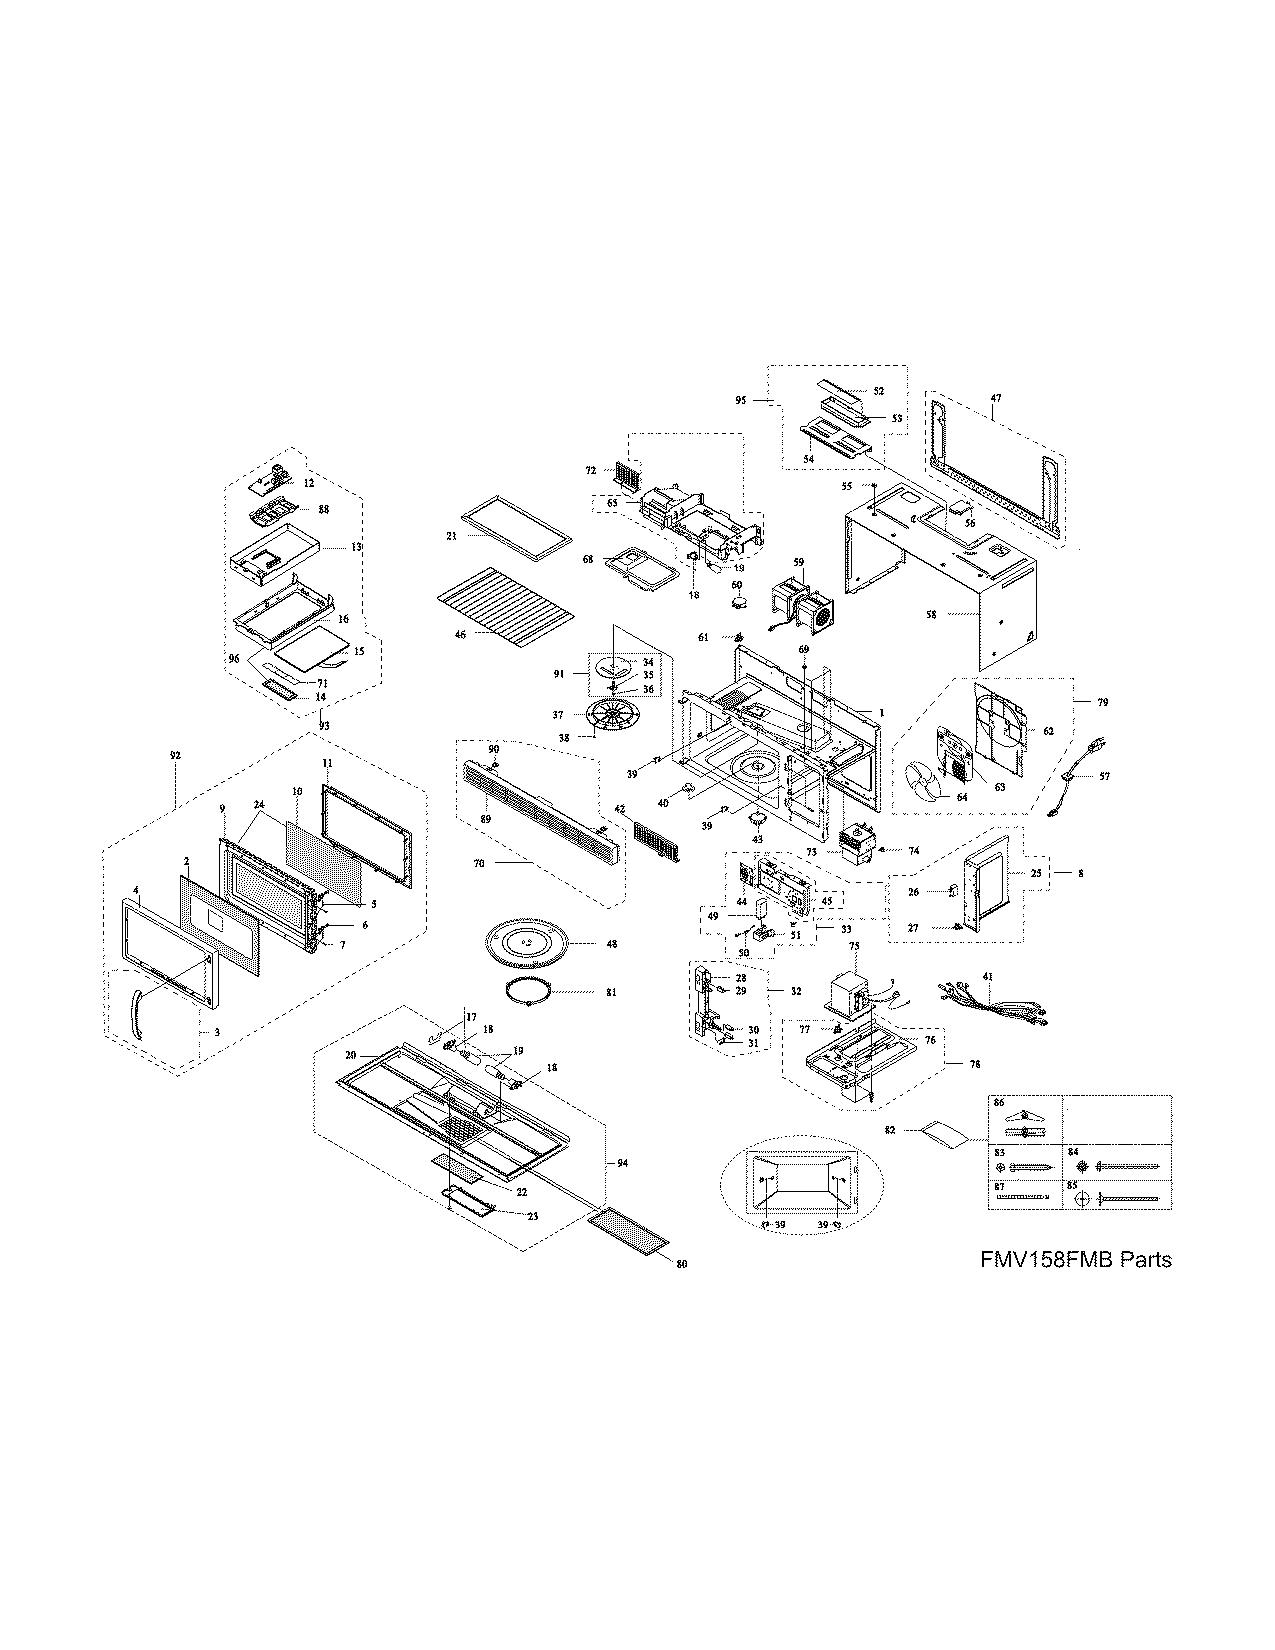 Frigidaire model FMV158FMB microwave/hood combo genuine parts